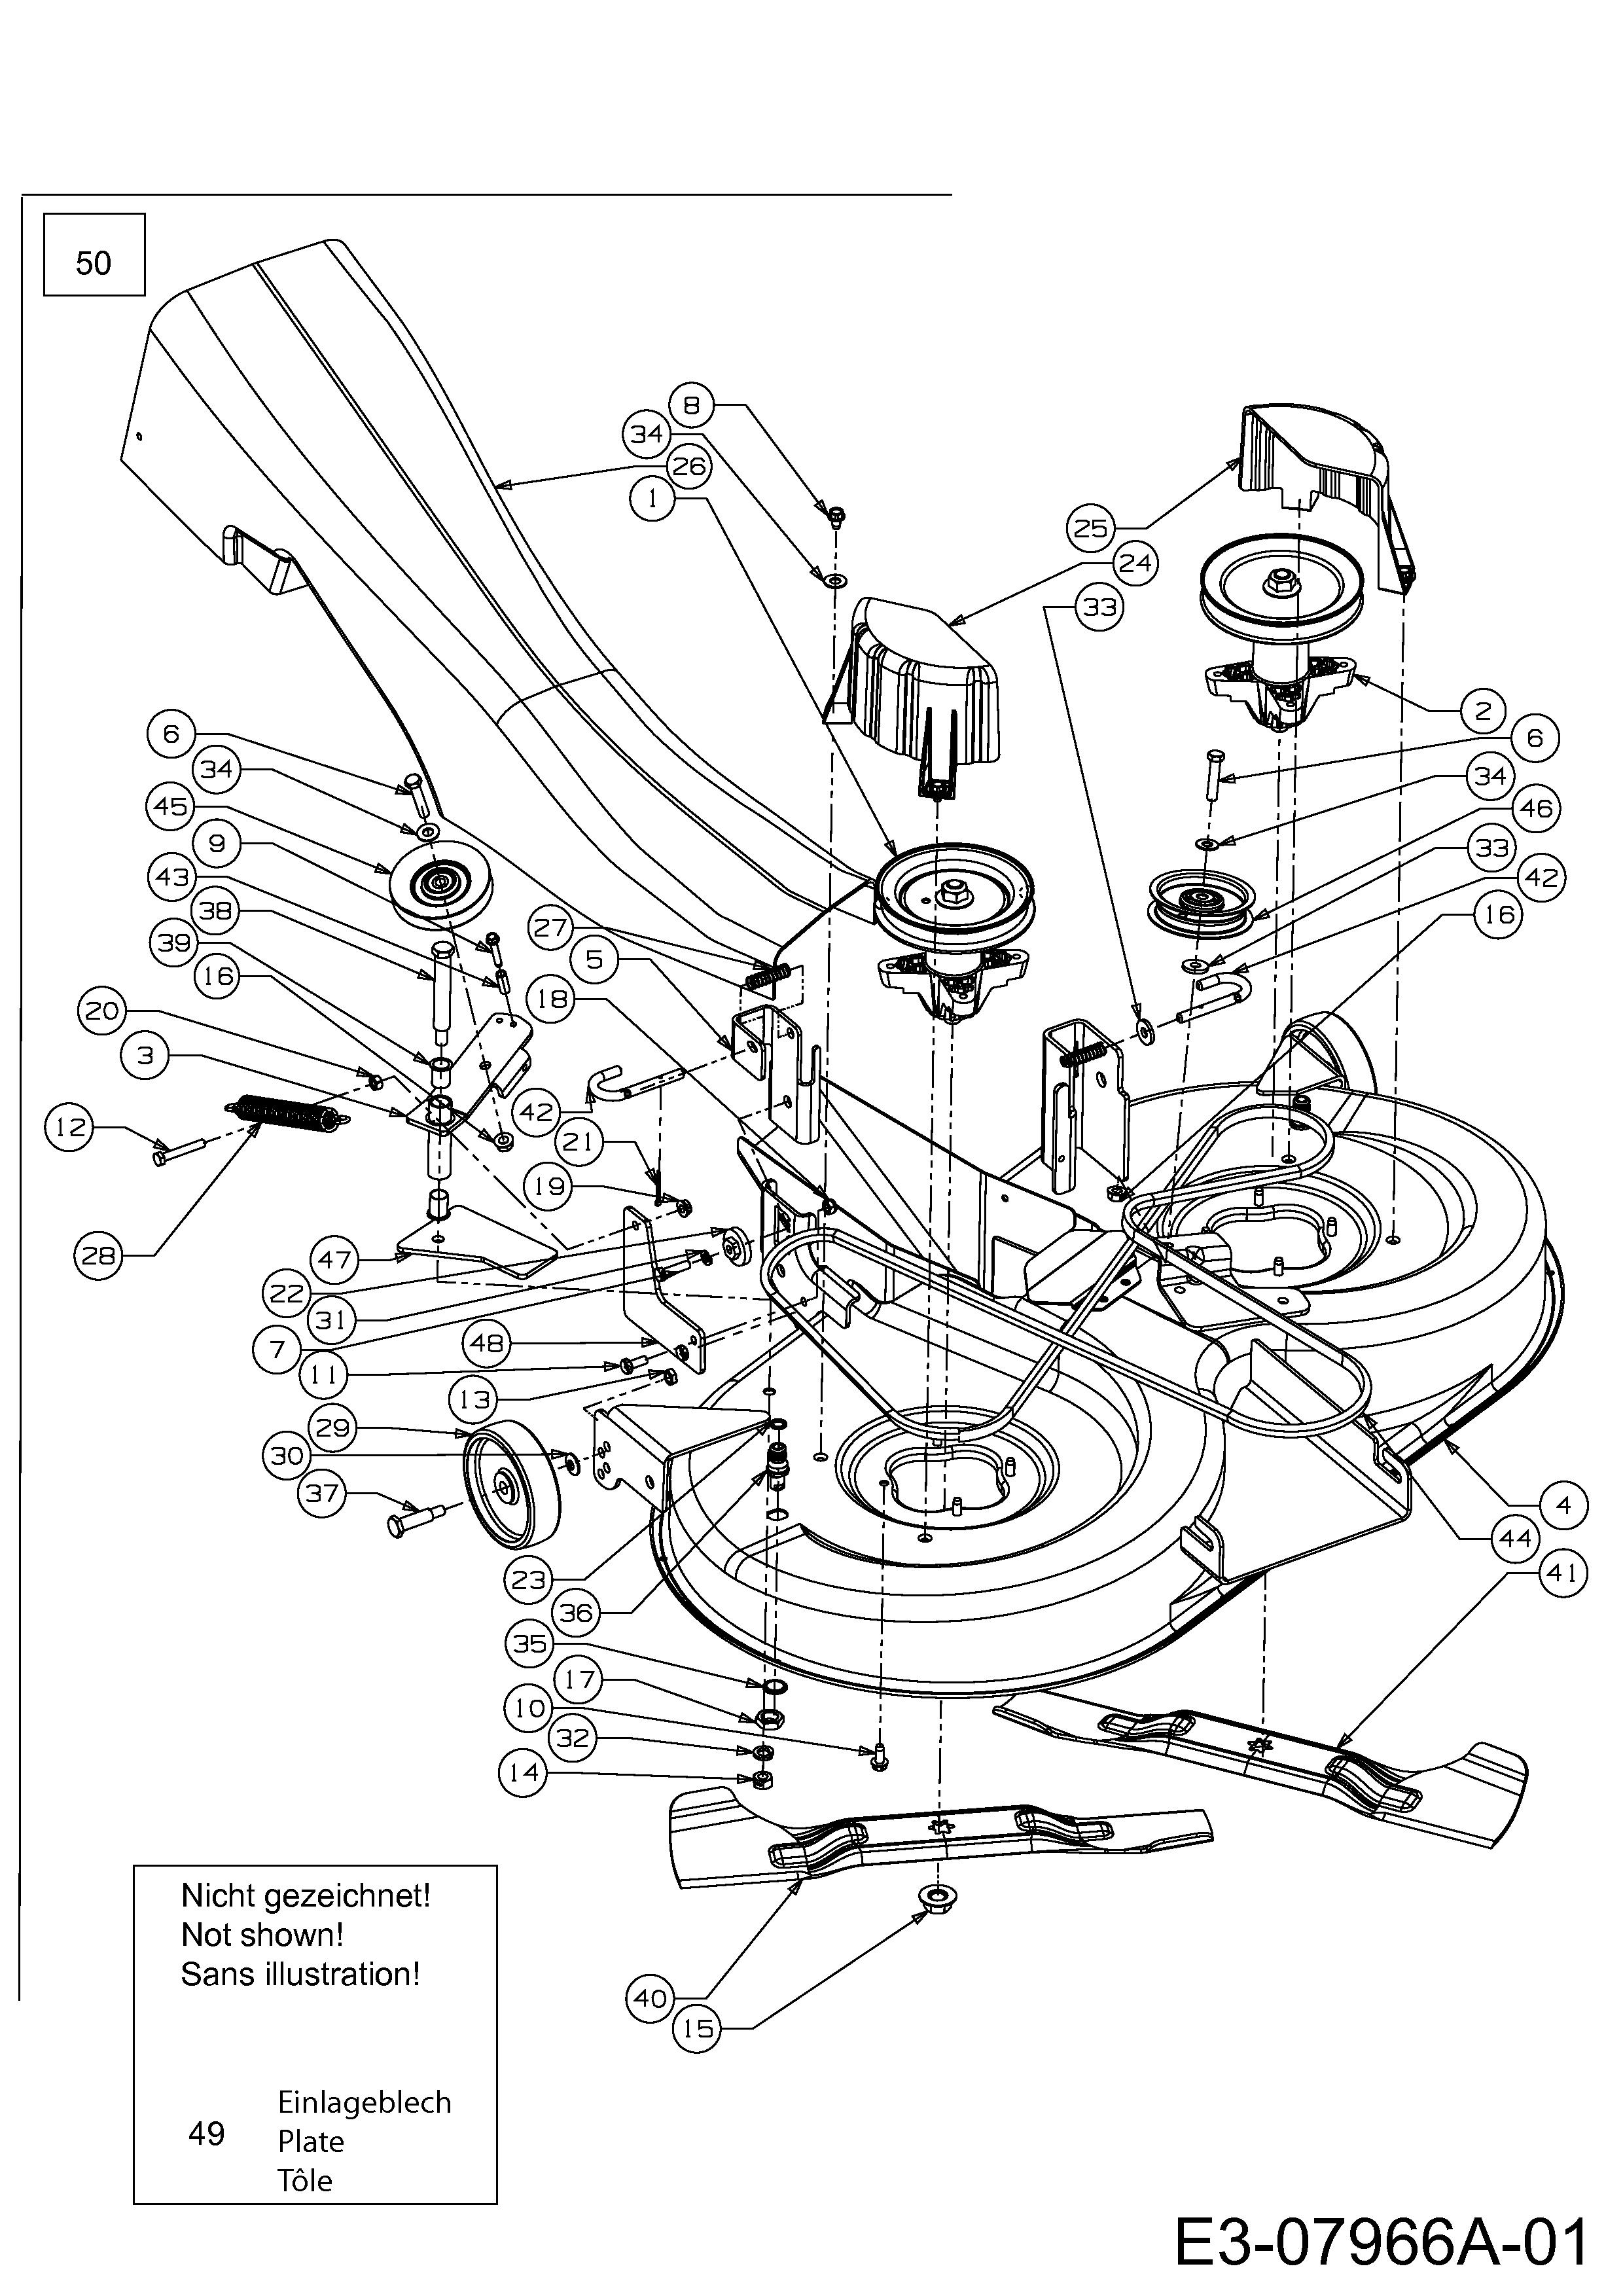 Keilriemen Mähwerk passend Gutbrod GLX 105 RH 13AV51GN490 Rasentraktor